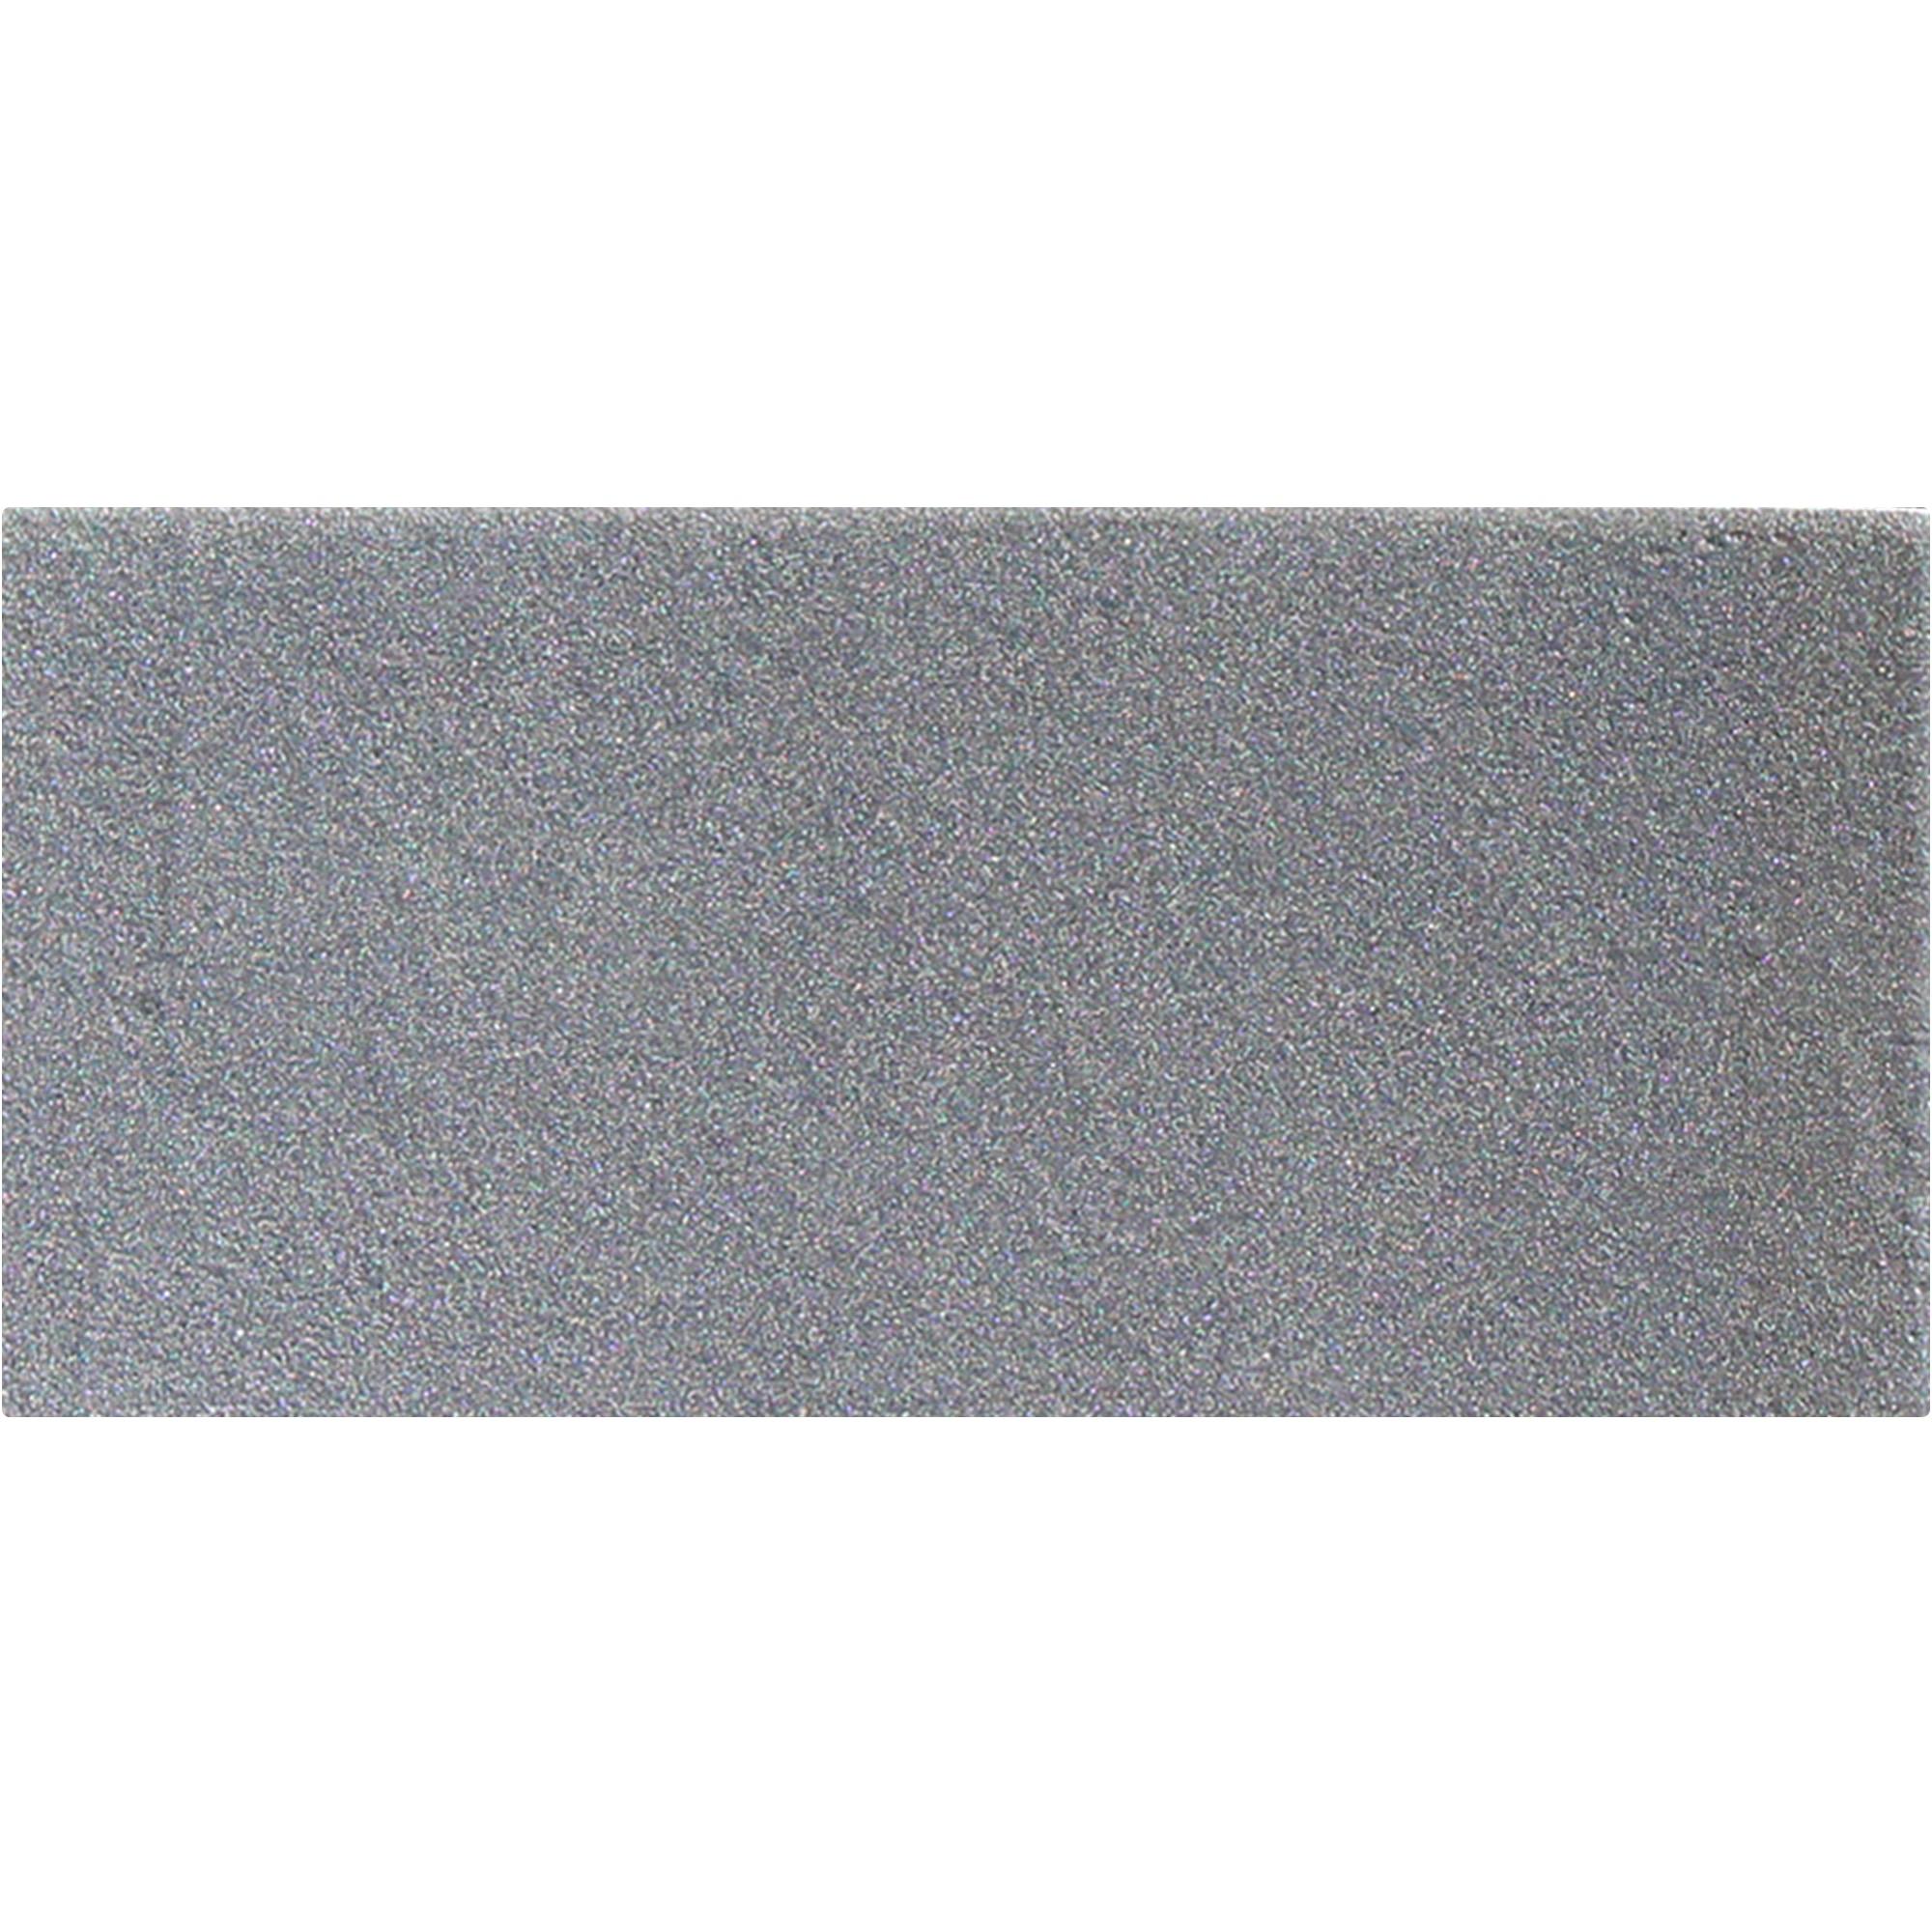 "Metallic Gray / 3""x6""x8mm / Glossy Glass Mosaic - Metallic Gray 0"